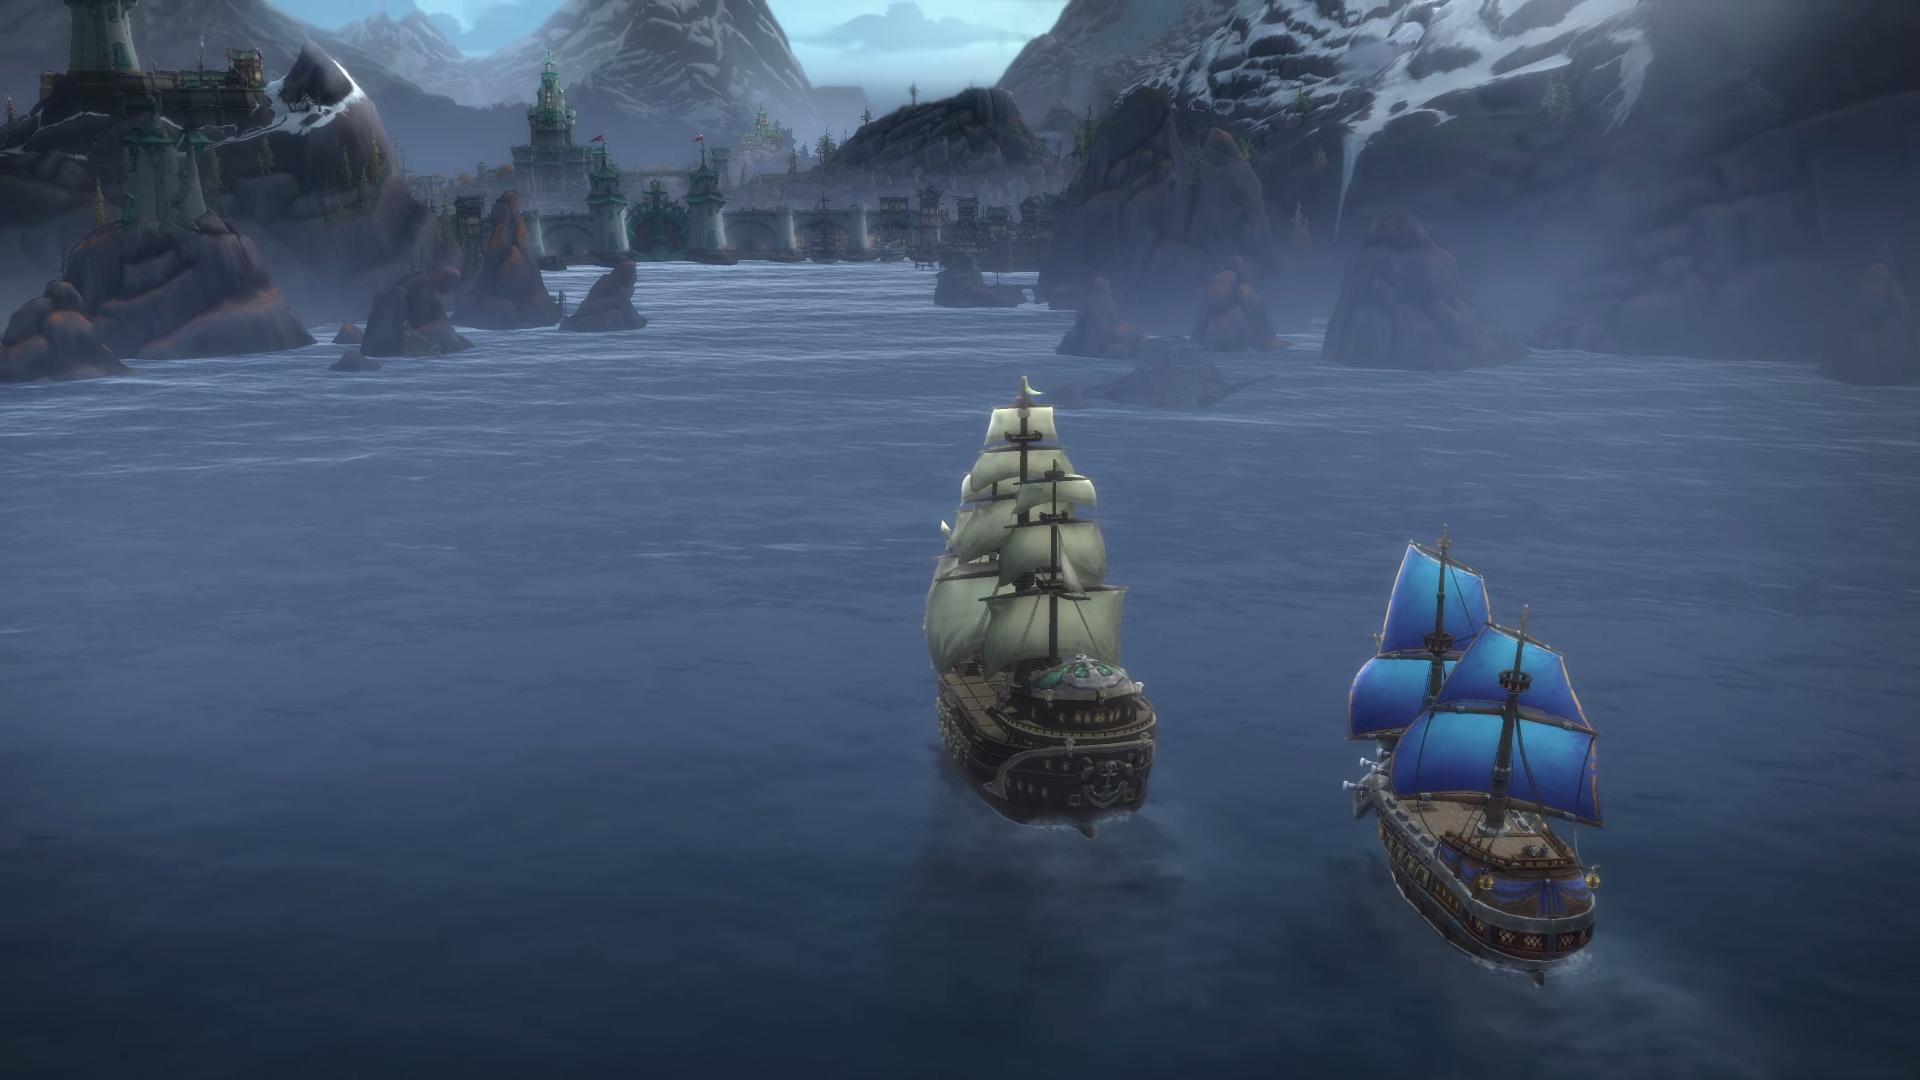 World Of Warcraft Screenshot 2018.08.18 - 16.27.04.82.png - World of Warcraft